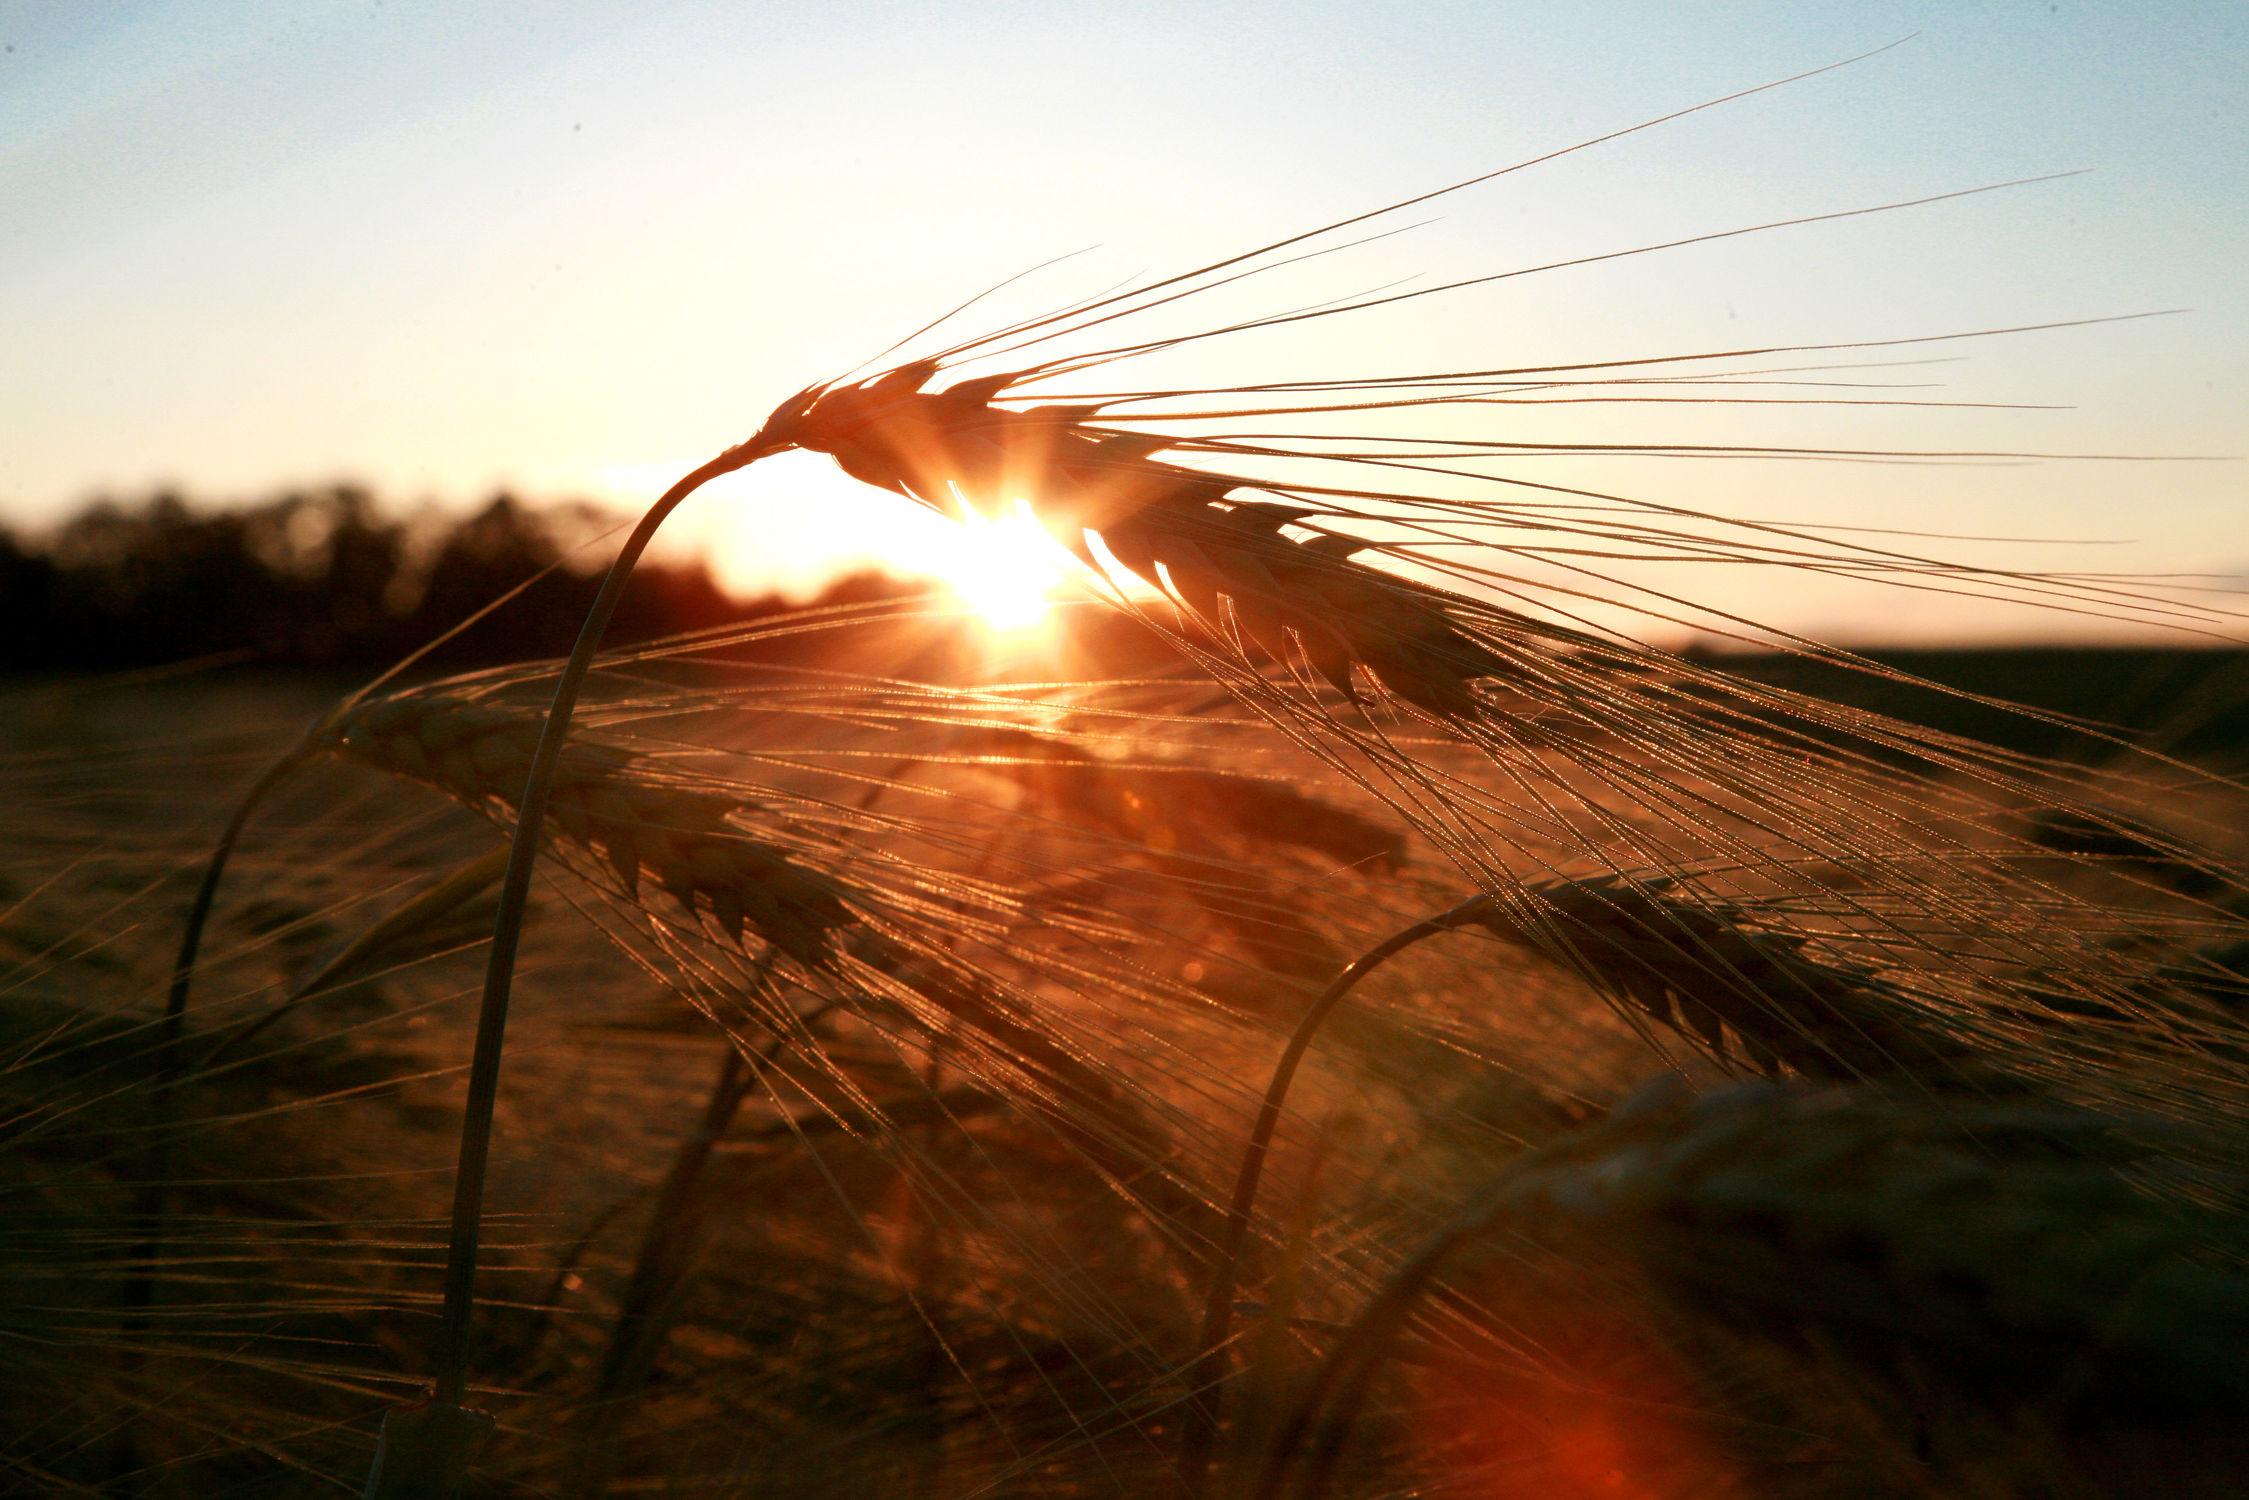 Bild mit Landschaften, Getreide, Landschaft, Feld, Felder, landwirtschaft, Weizen, Getreide Feld